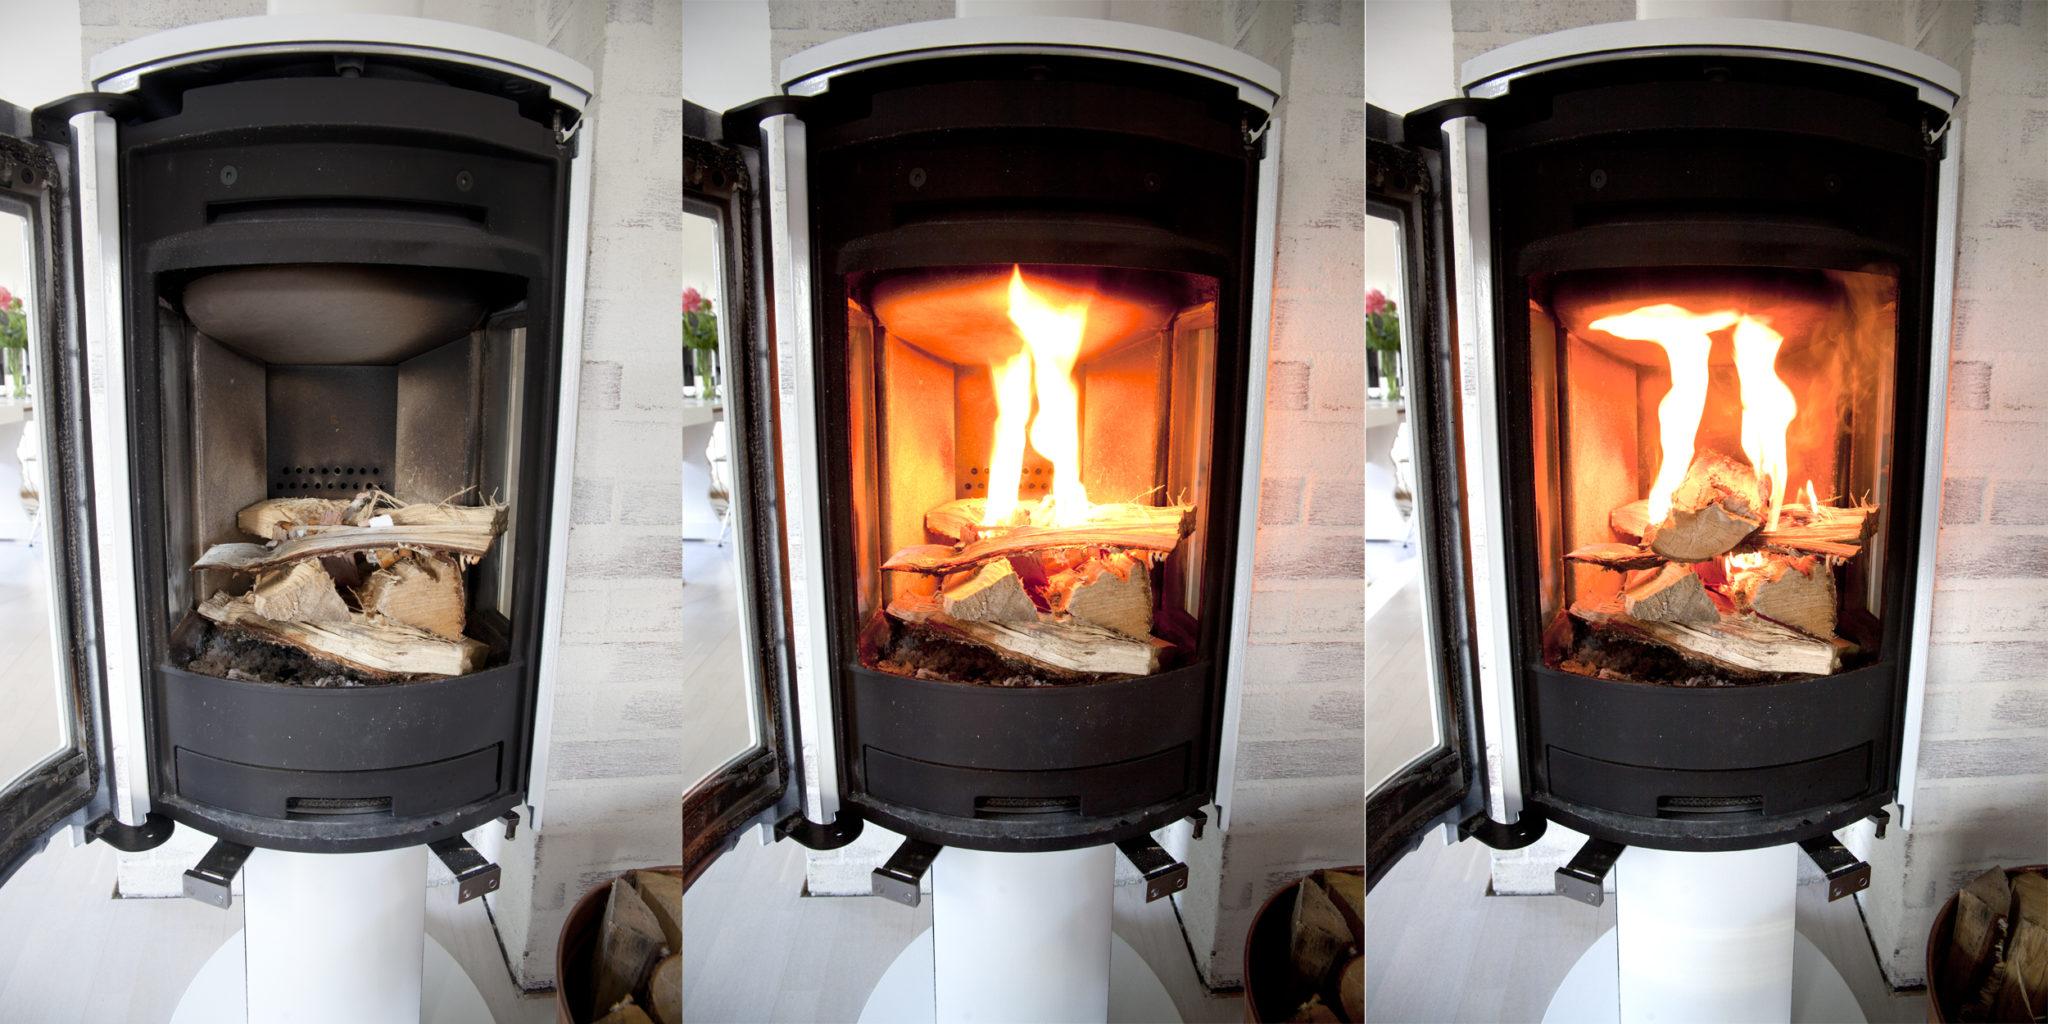 jøtul ovn f373 hvit opptenning